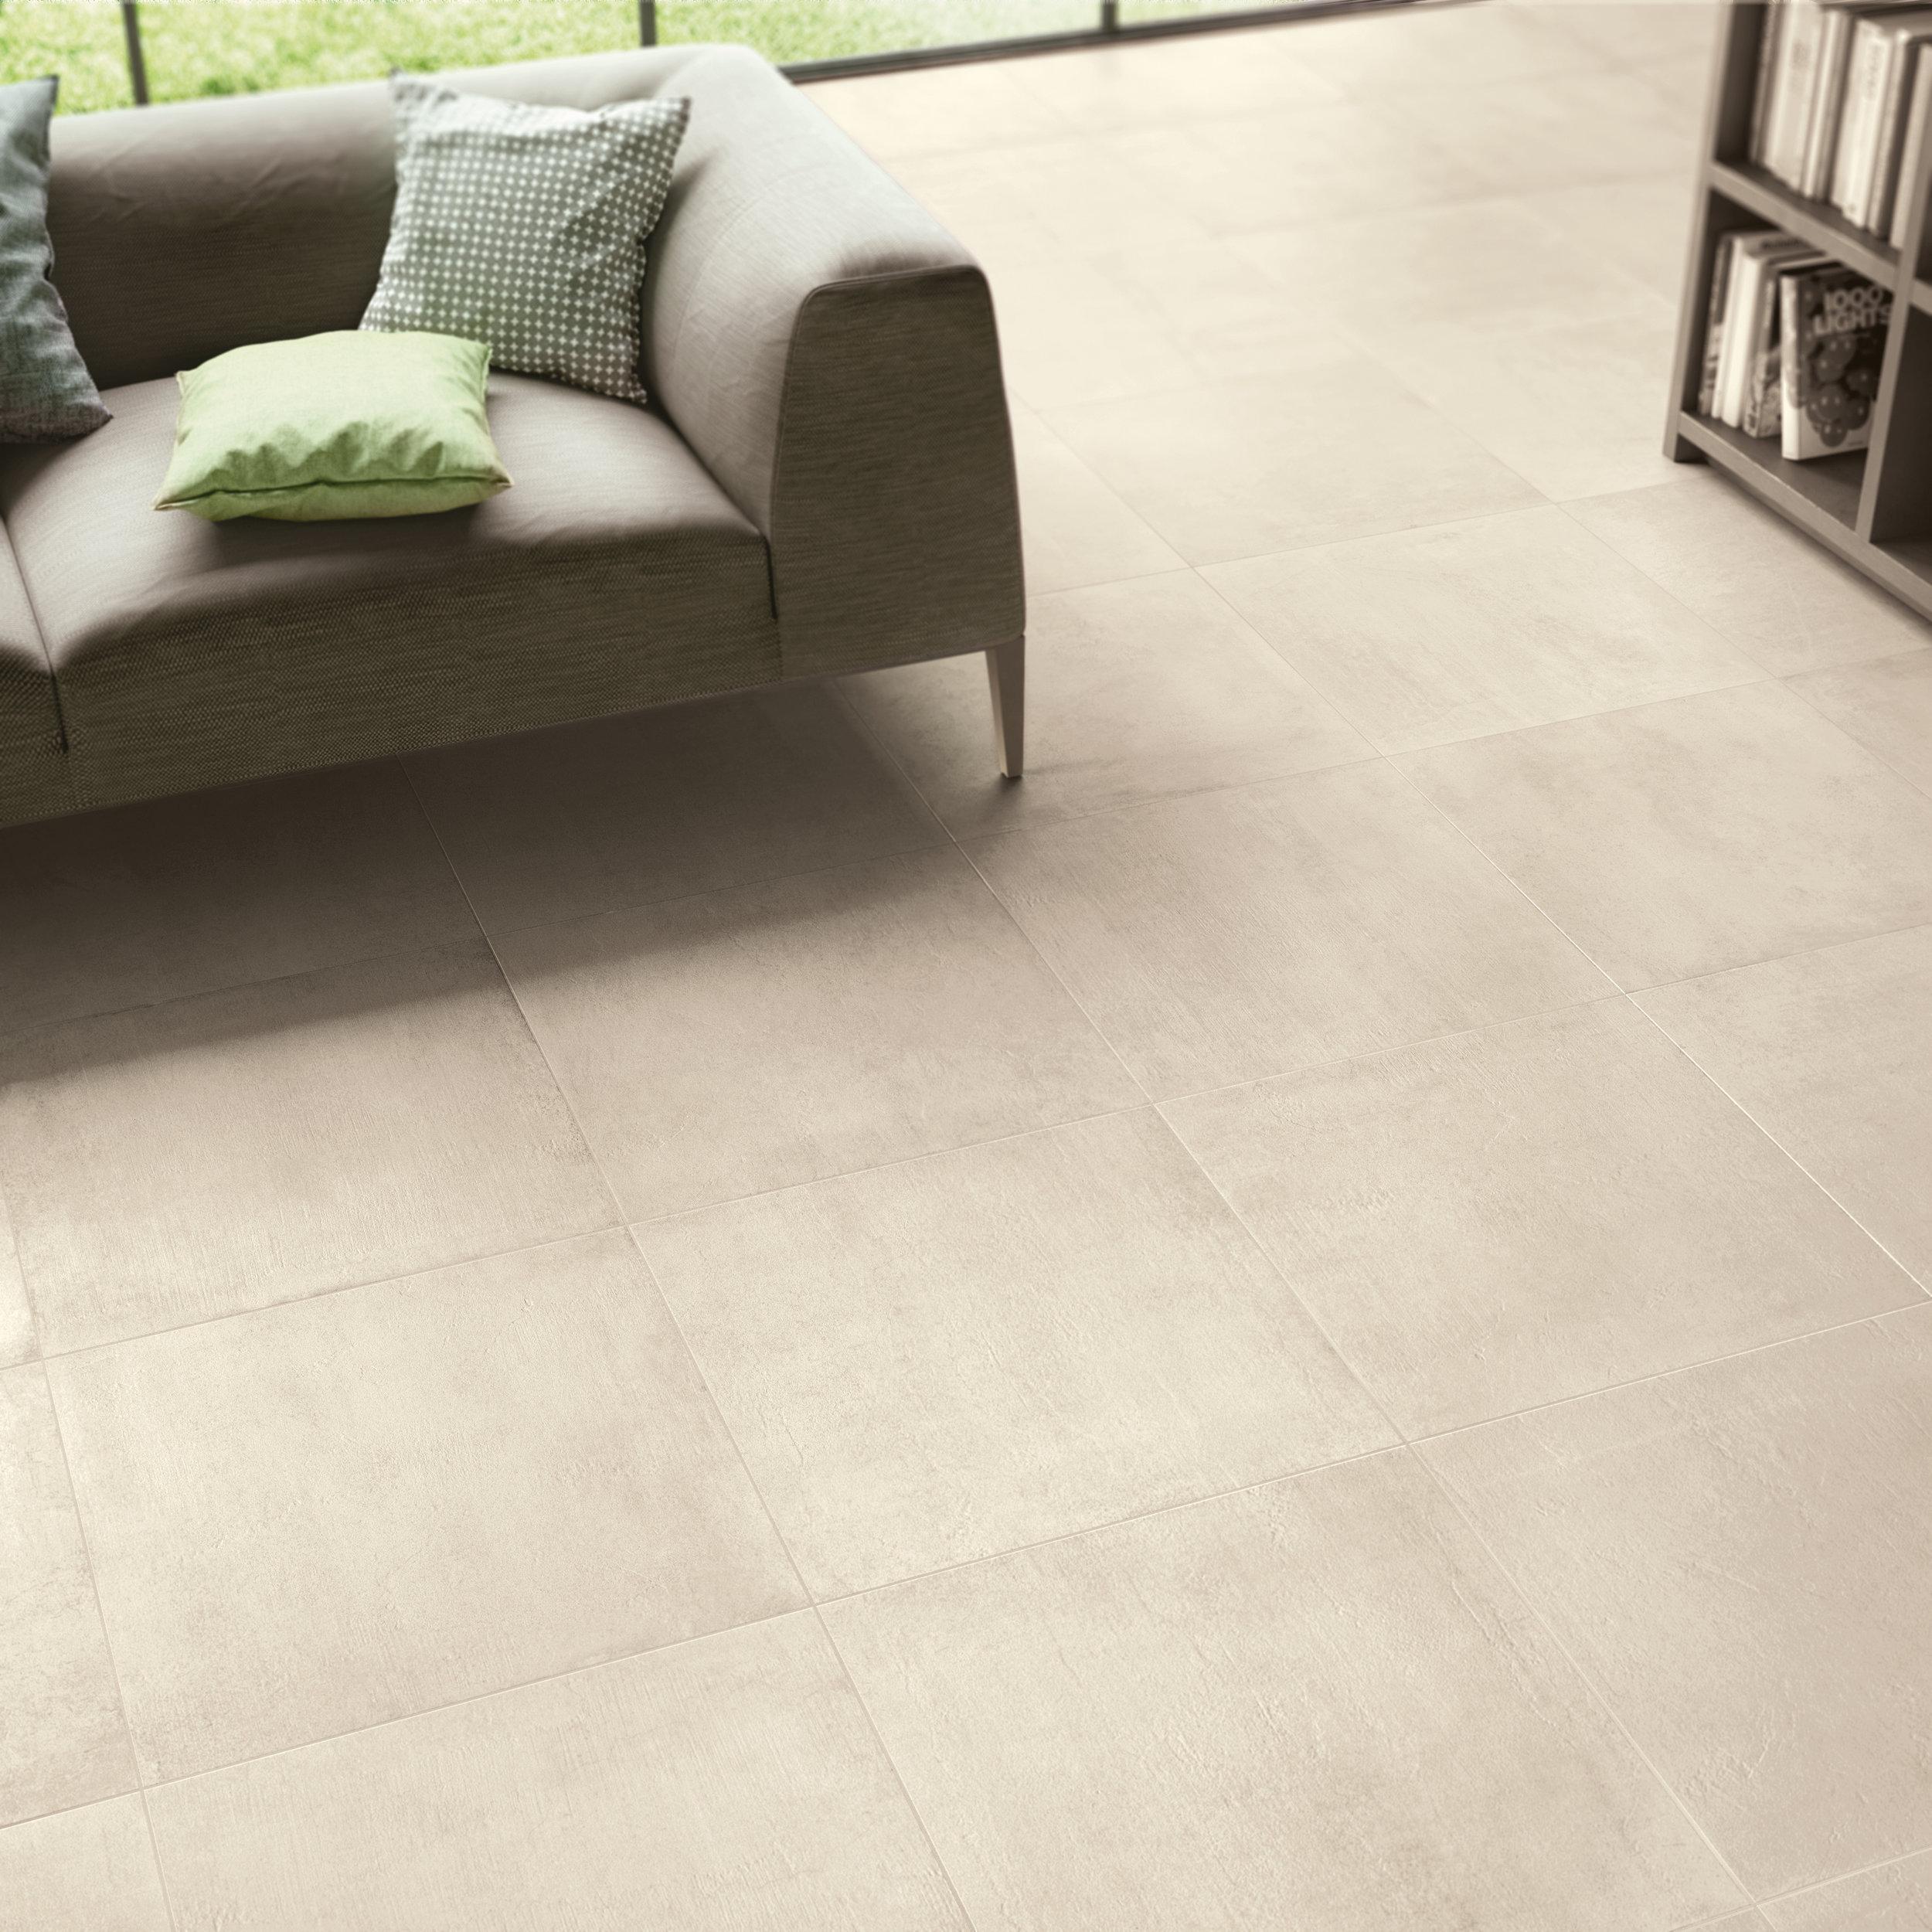 BLU-concretejungle-atelier25-natural-10mm-living-002.jpg